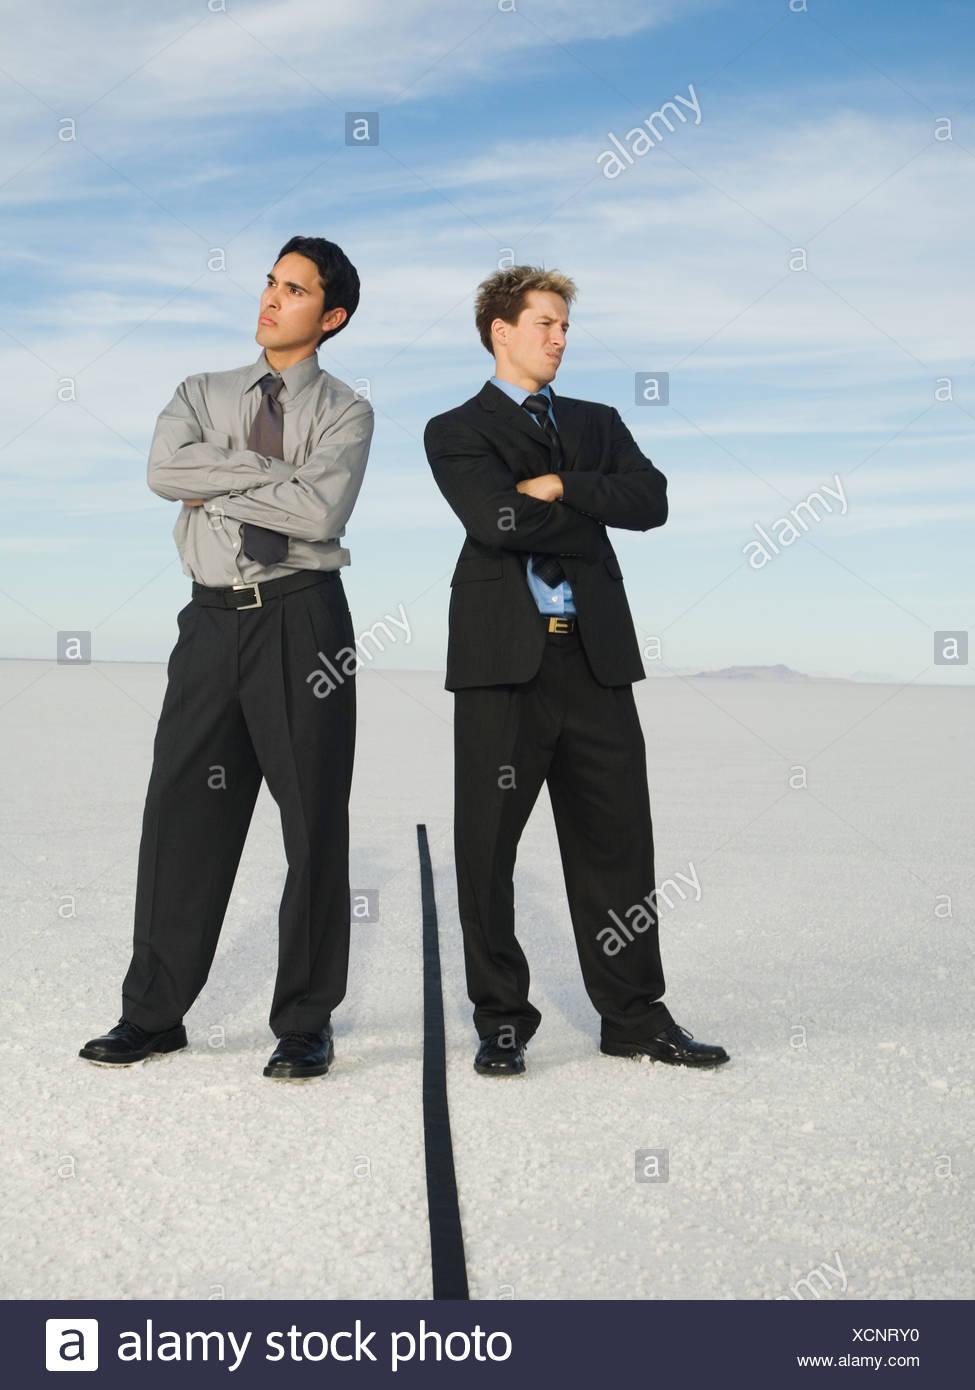 Businessmen on opposite sides of line, Salt Flats, Utah, United States - Stock Image